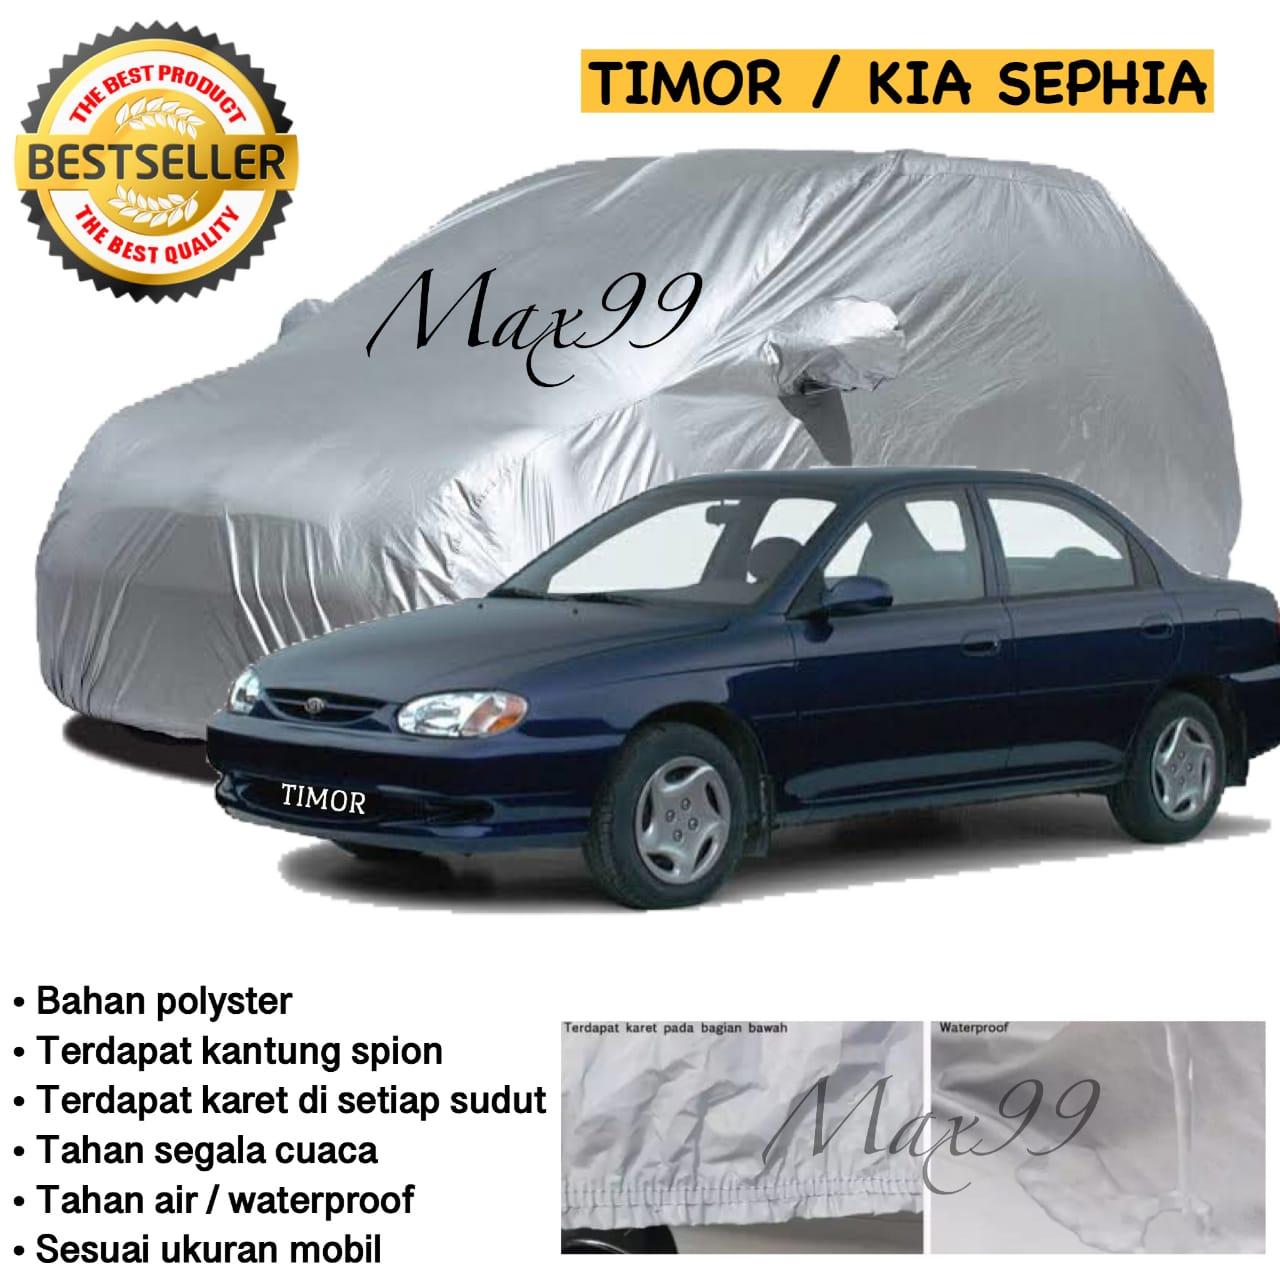 COD - Sarung Mobil Timor / Sarung Mobil Kia Sephia Car Body Cover Timor Silver Coating / Selimut Mobil Sedan Timor / Mantel Mobil Timor / Penutup Mobil Timor - Max99